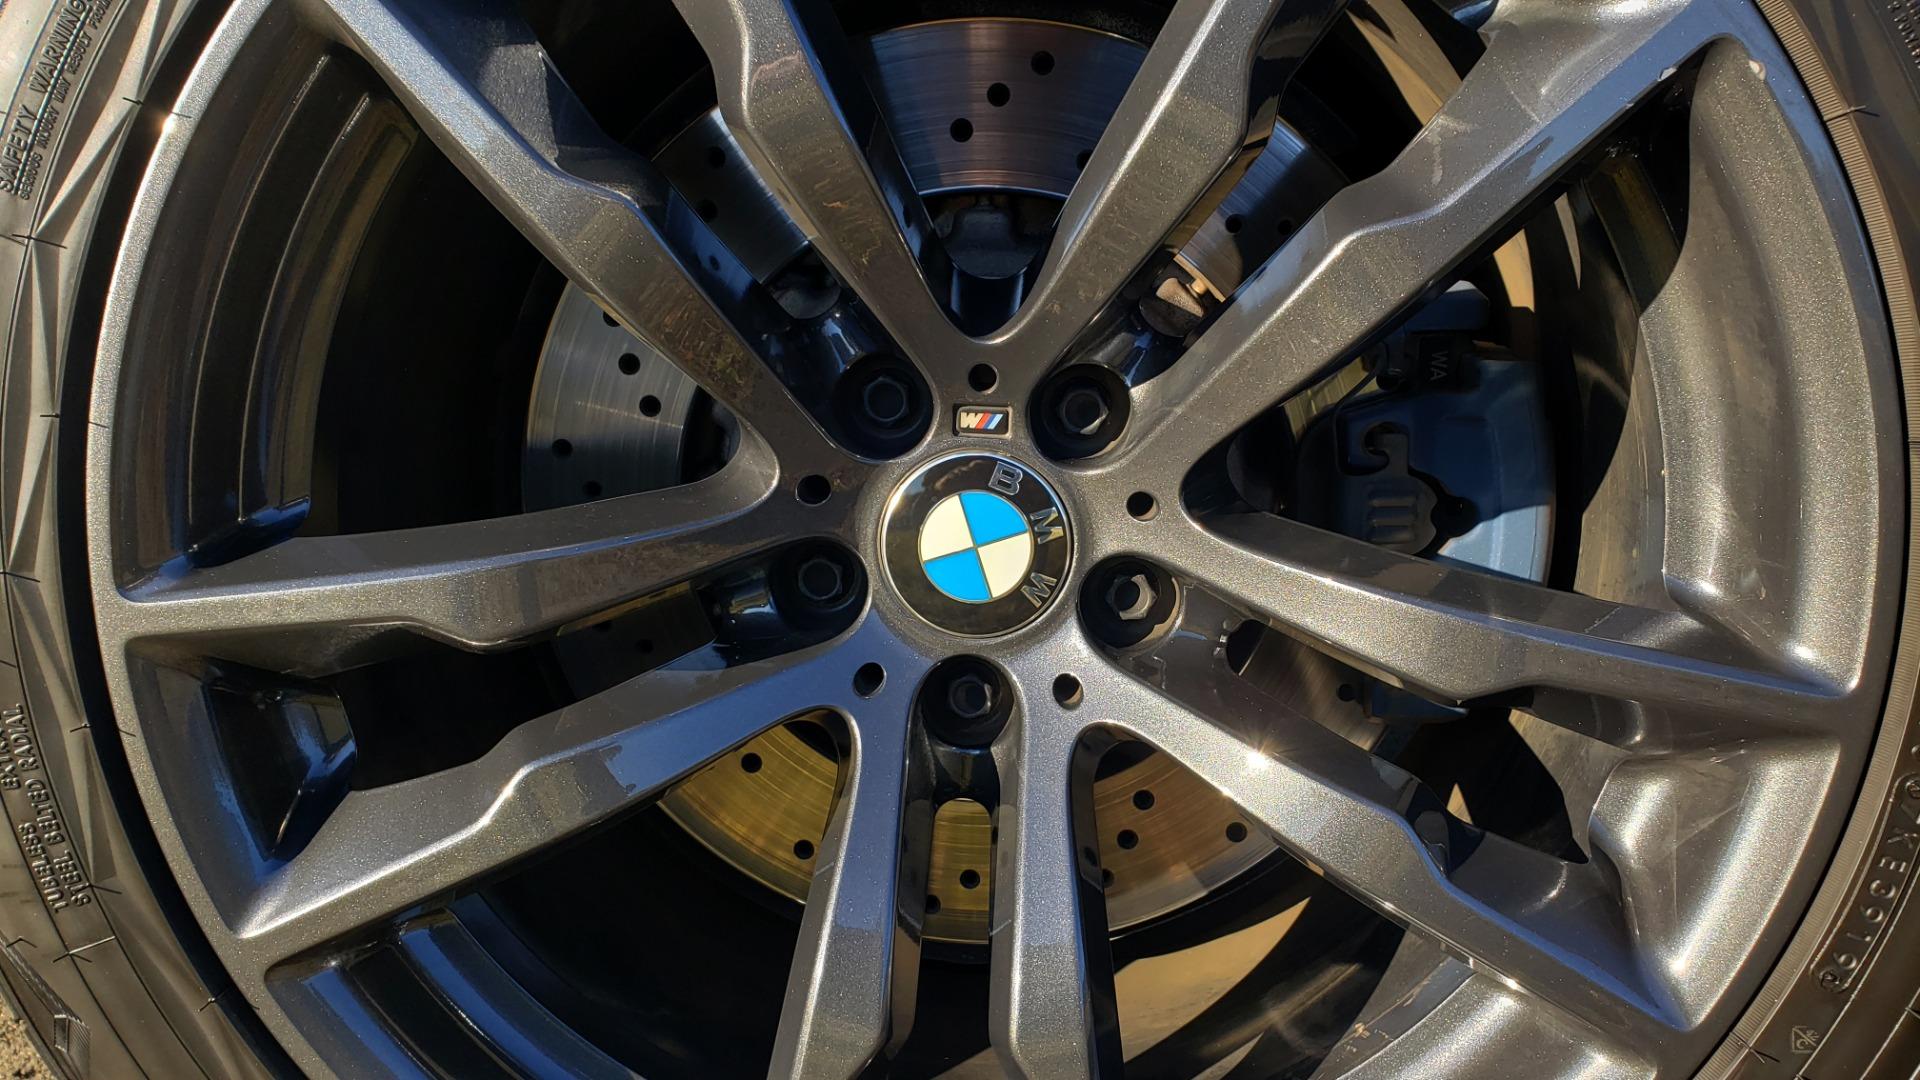 Used 2016 BMW X6 M EXEC PKG / DRVR ASST / NAV / SUNROOF / BLIND SPOT / REARVIEW for sale Sold at Formula Imports in Charlotte NC 28227 94